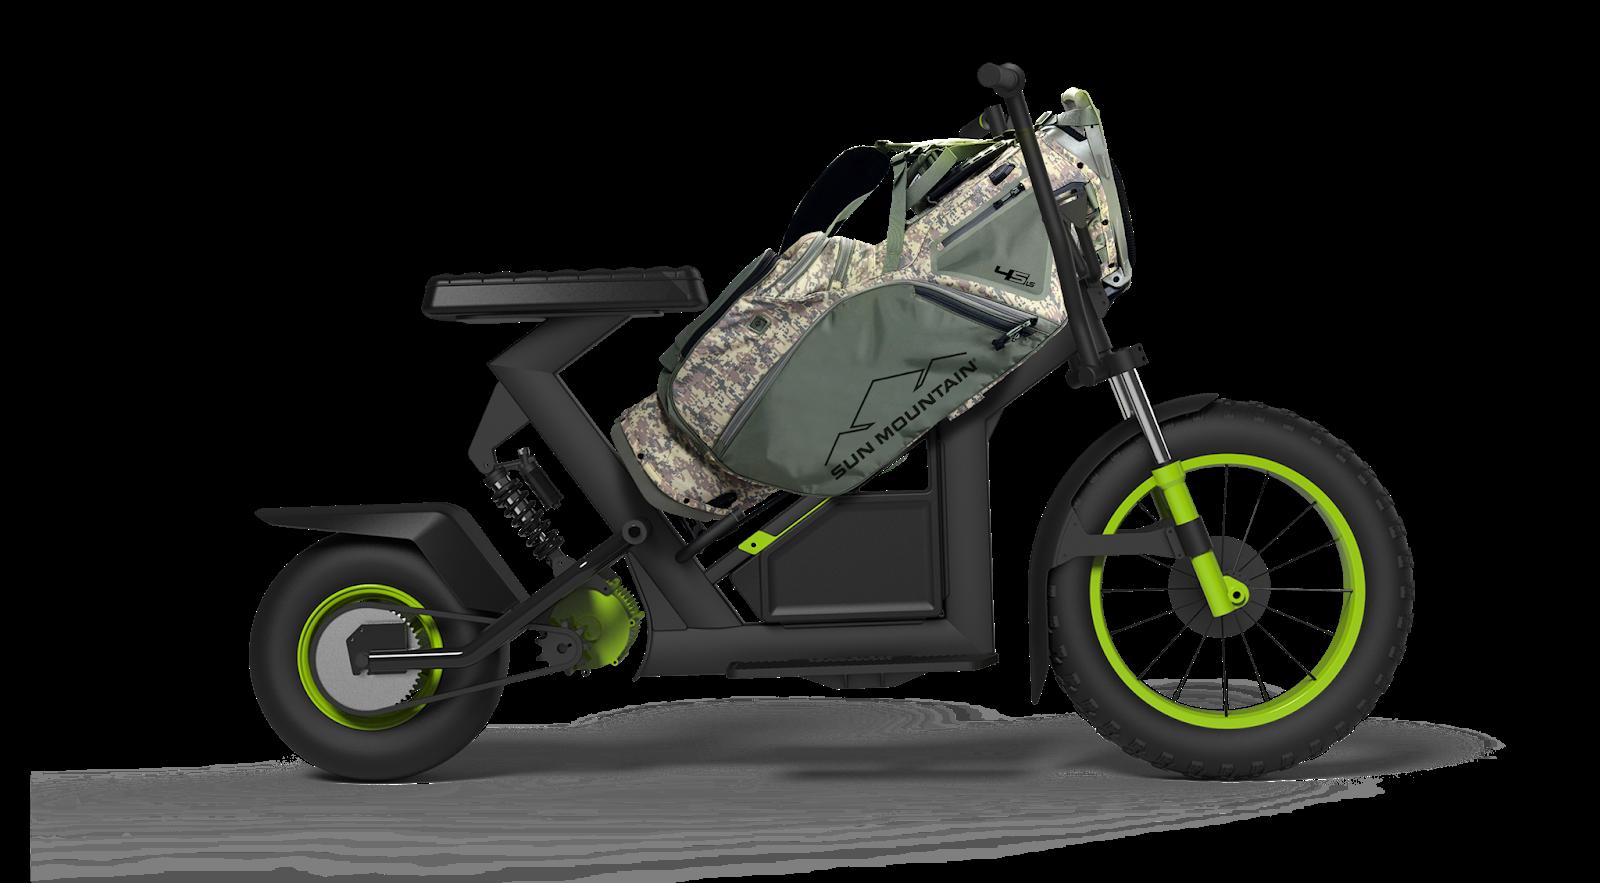 cd7a08505c (Missoula, Montana) – Sun Mountain Motor Sports, an affiliate of  industry-leading golf bag, golf push cart and golf outerwear company, Sun  Mountain Sports, ...